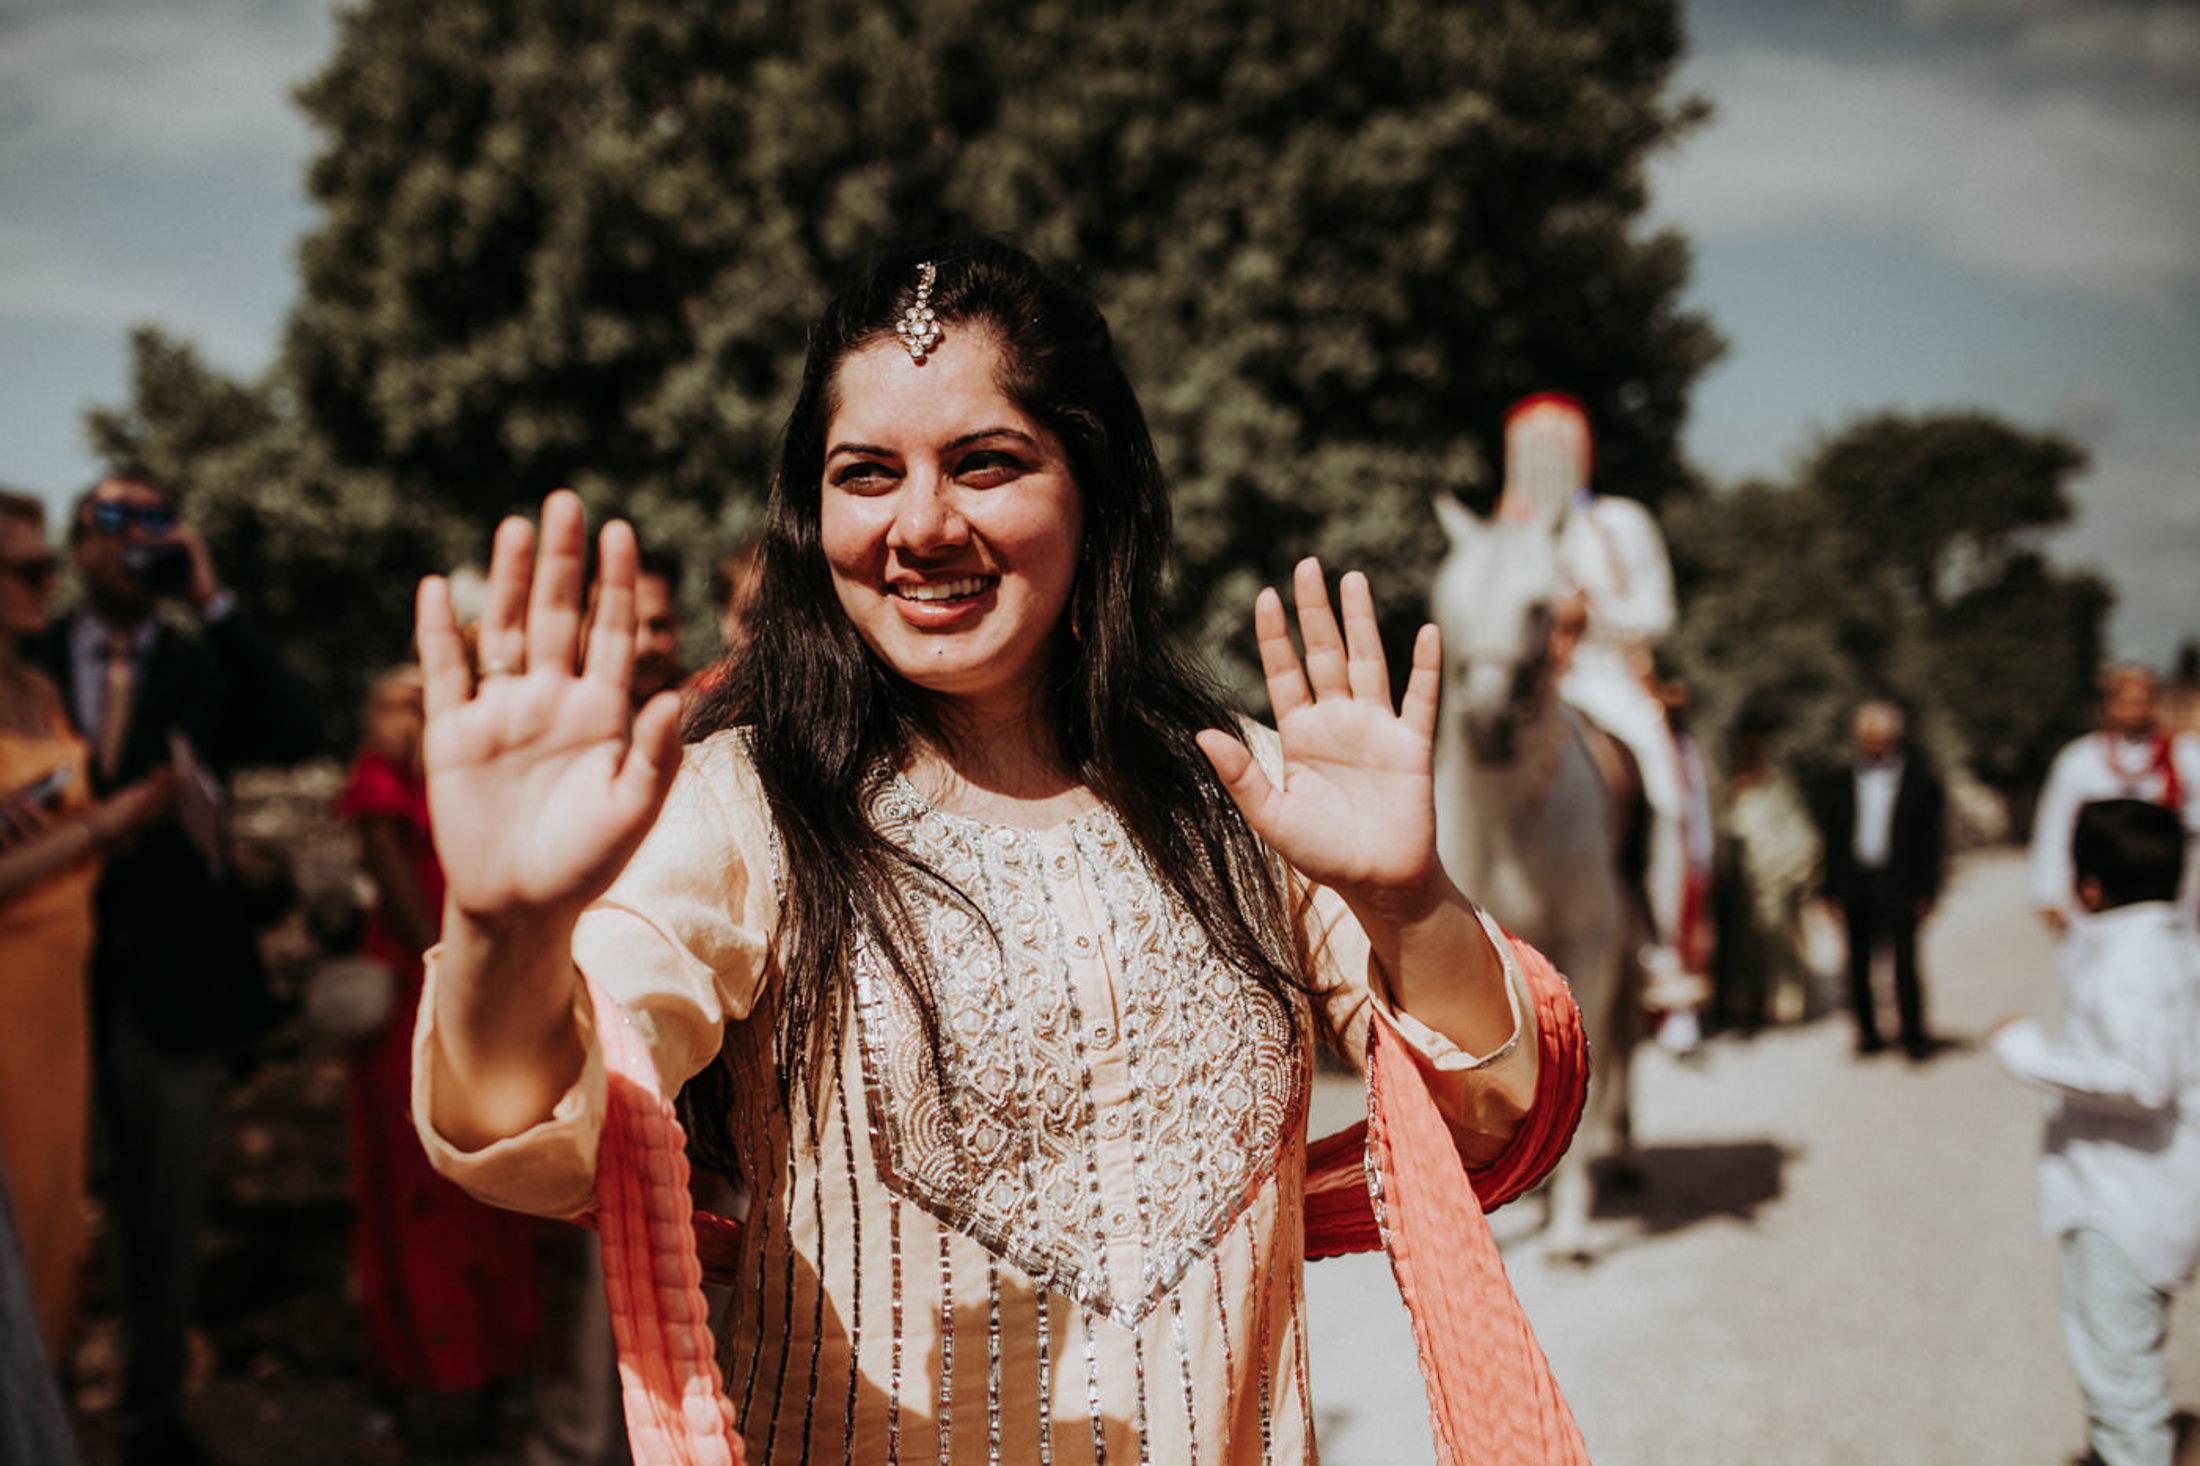 Wedding_Photographer_Mallorca_Daniela-Marquardt_Photography_New_York_Iceland_Tuscany_Santorini_Portugal_Austria_Bavaria_Elopement_Hochzeitsfotograf_AntjeRajat2_30